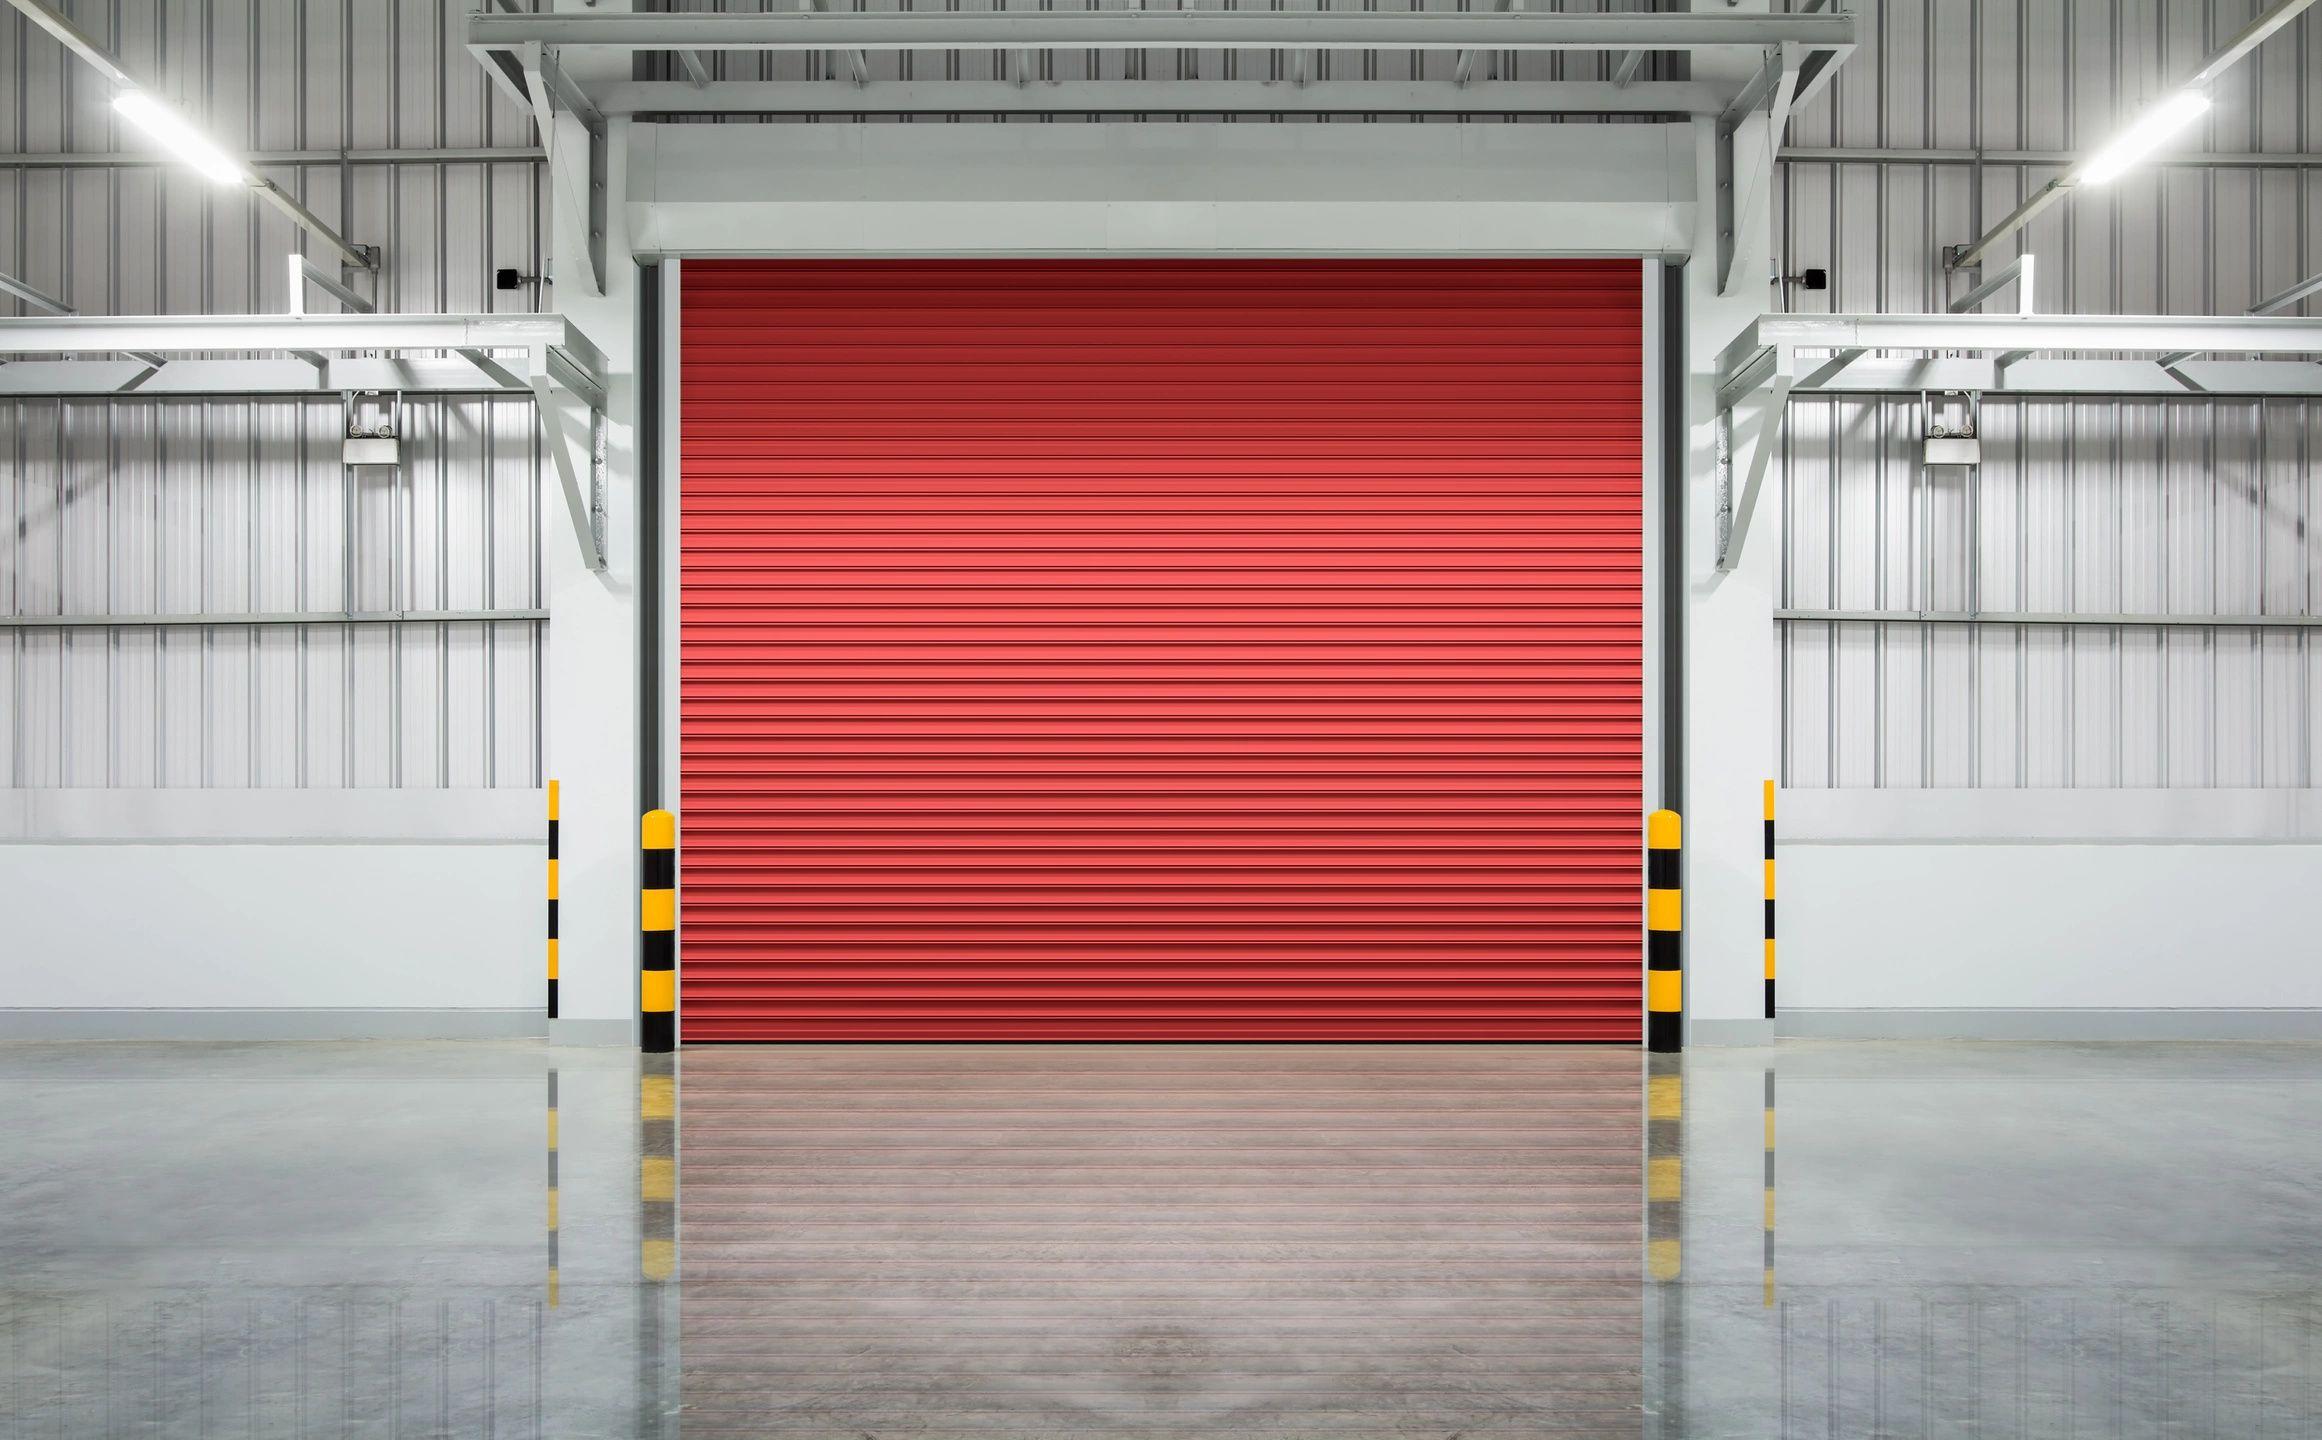 Commercial Garage Doors Austin, Round Rock, Cedar Park TX